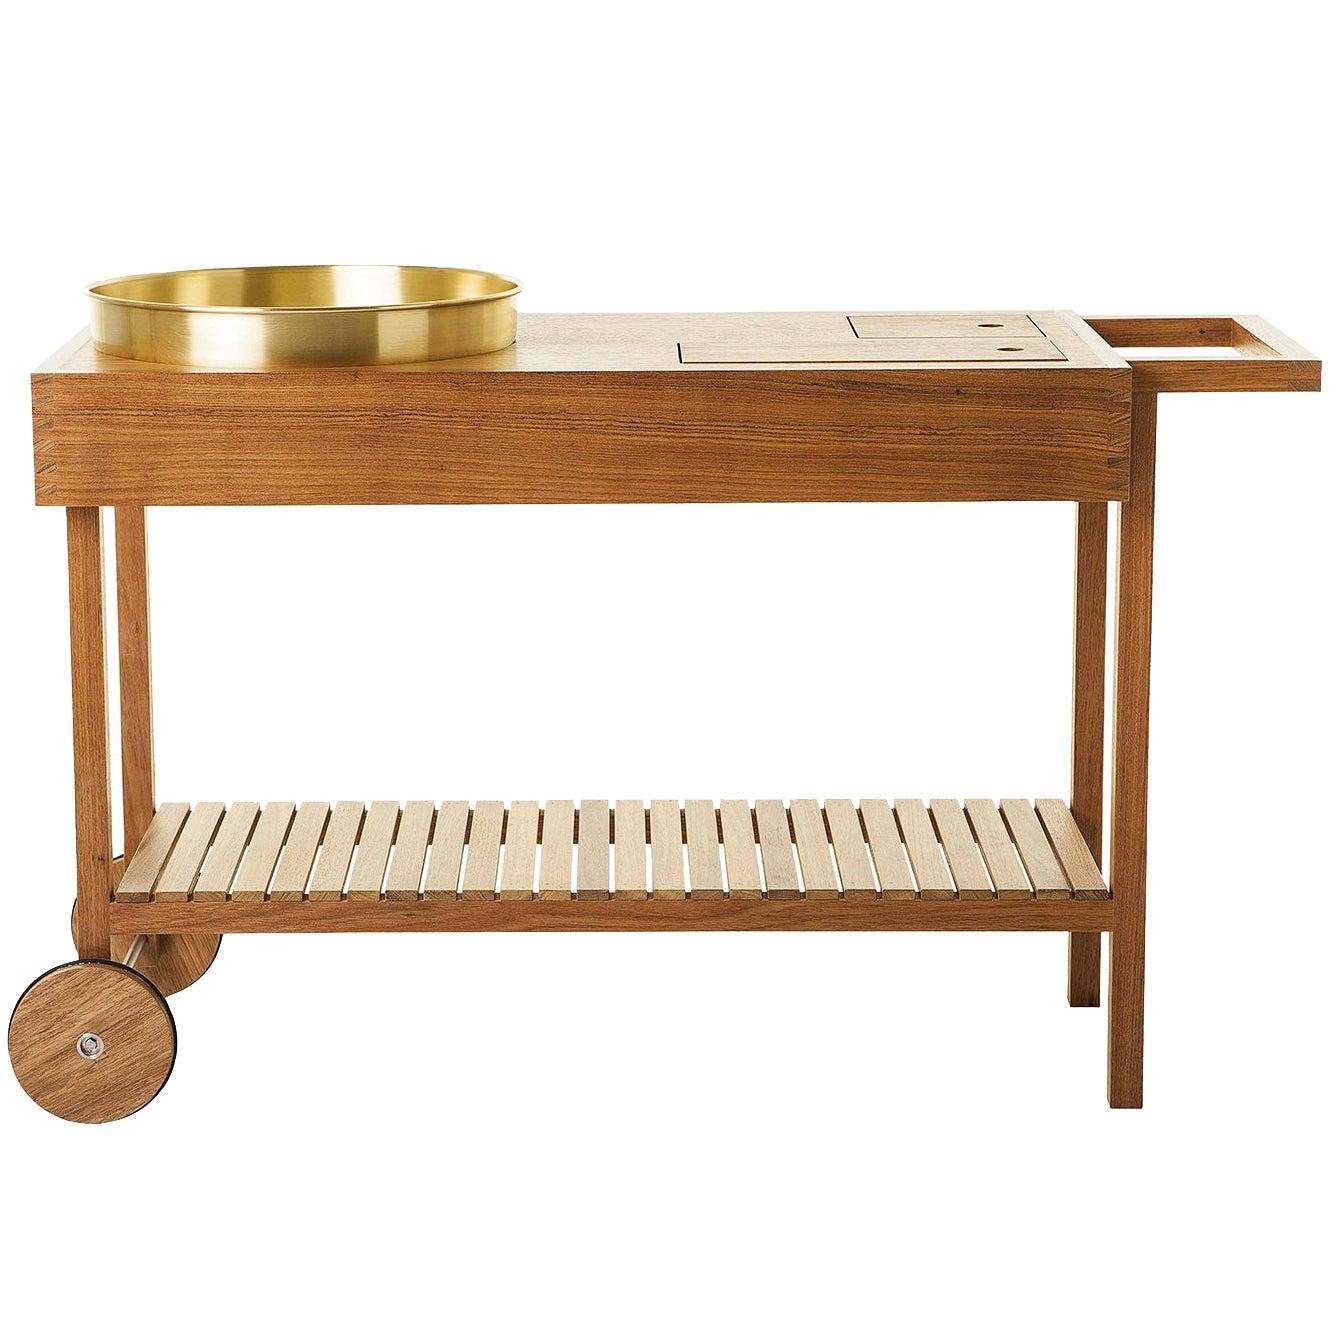 Bar Cart in Tropical Brazilian Hardwood, Contemporary Design